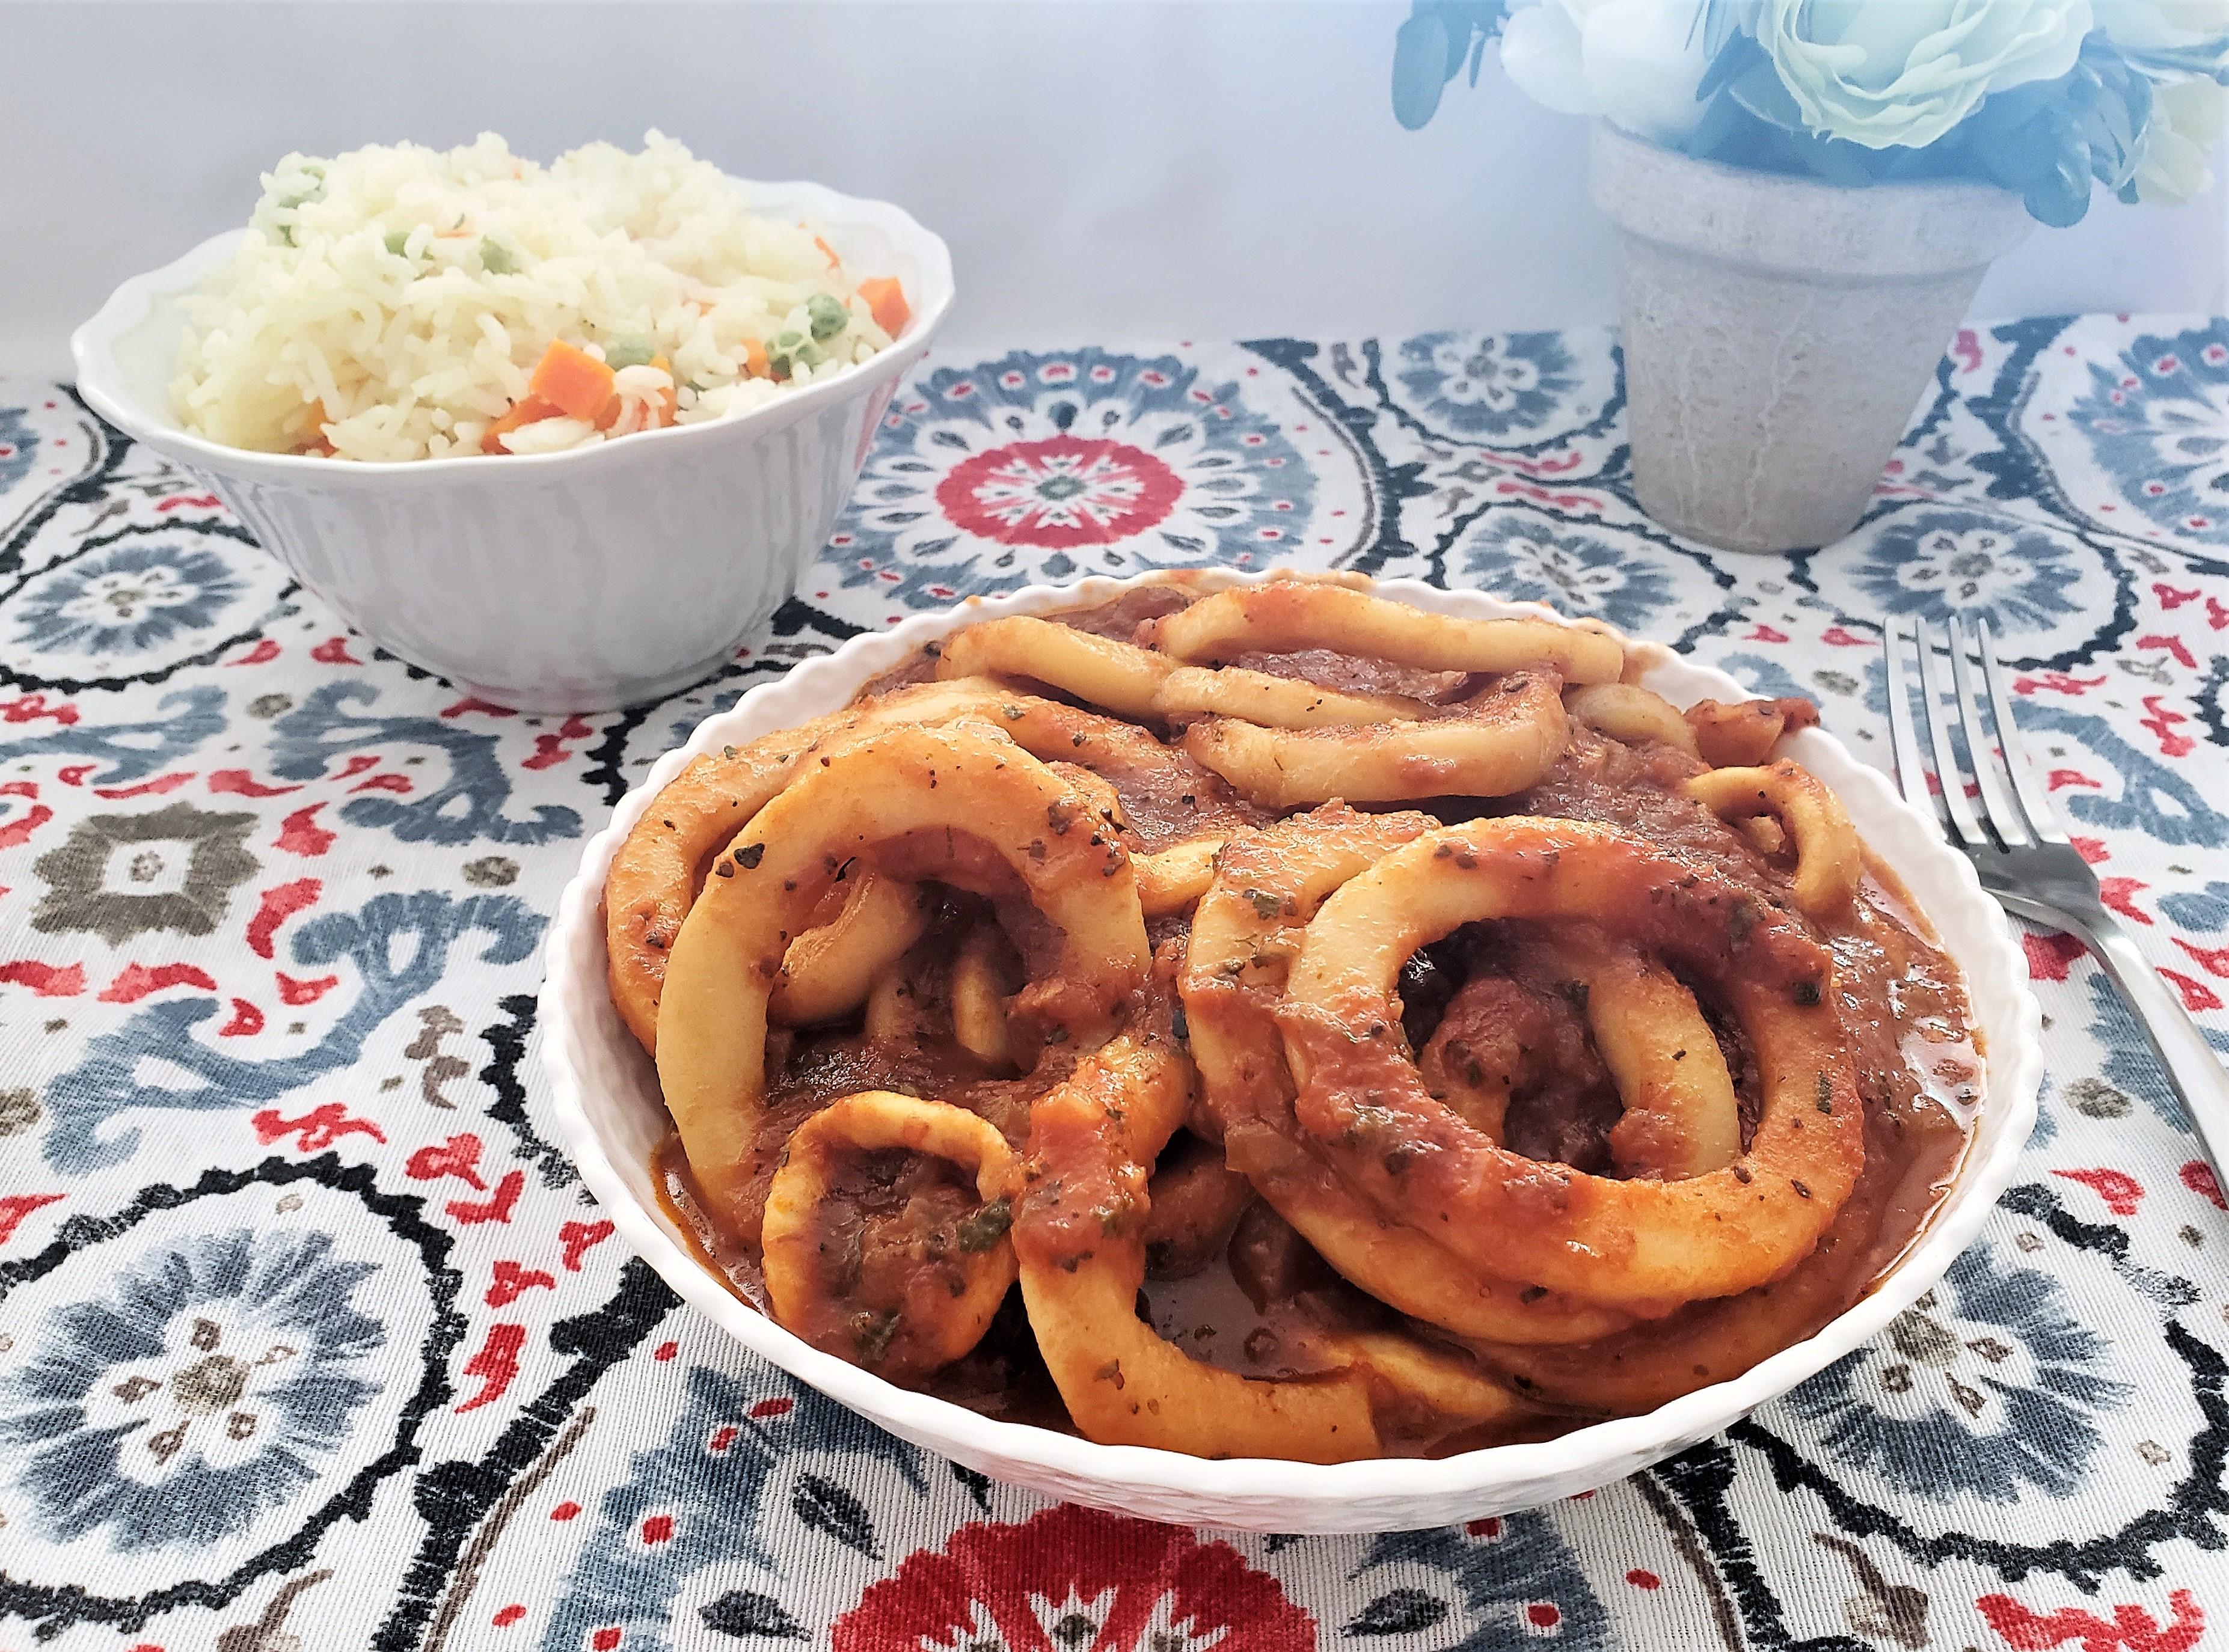 Calamares en salsa de jitomate